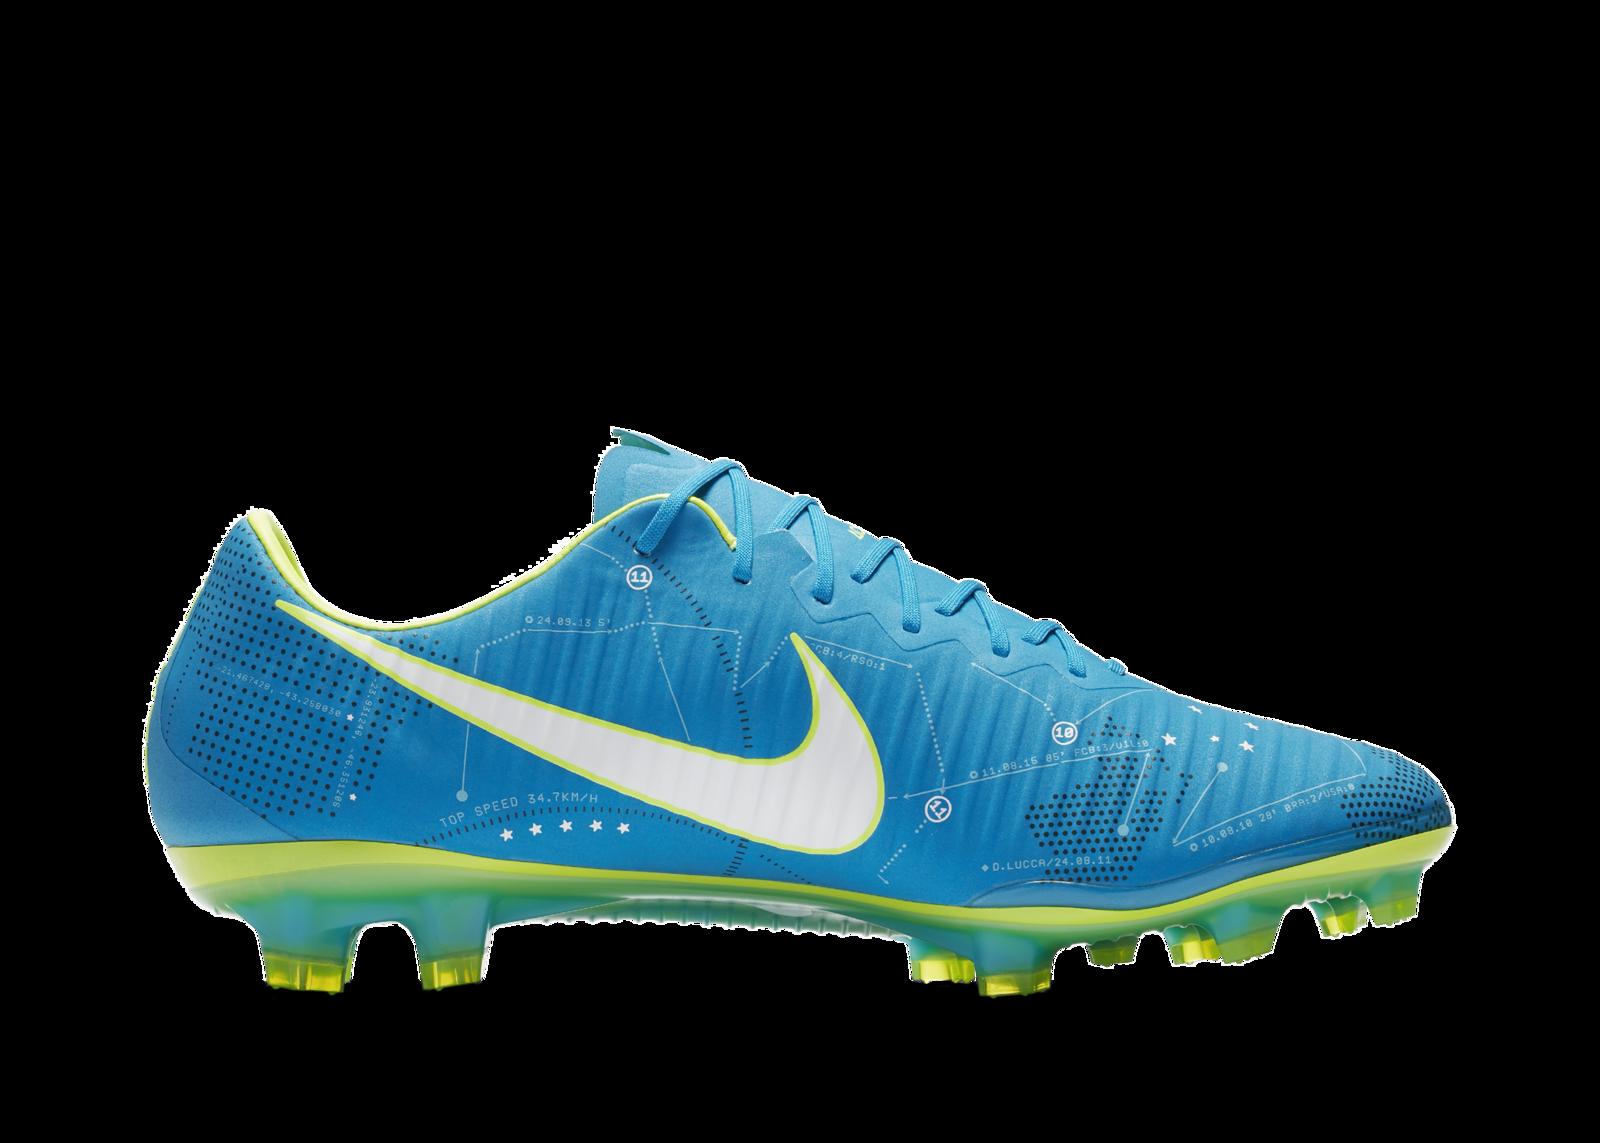 nike shoes soccer neymar 2017 boots this season 948268